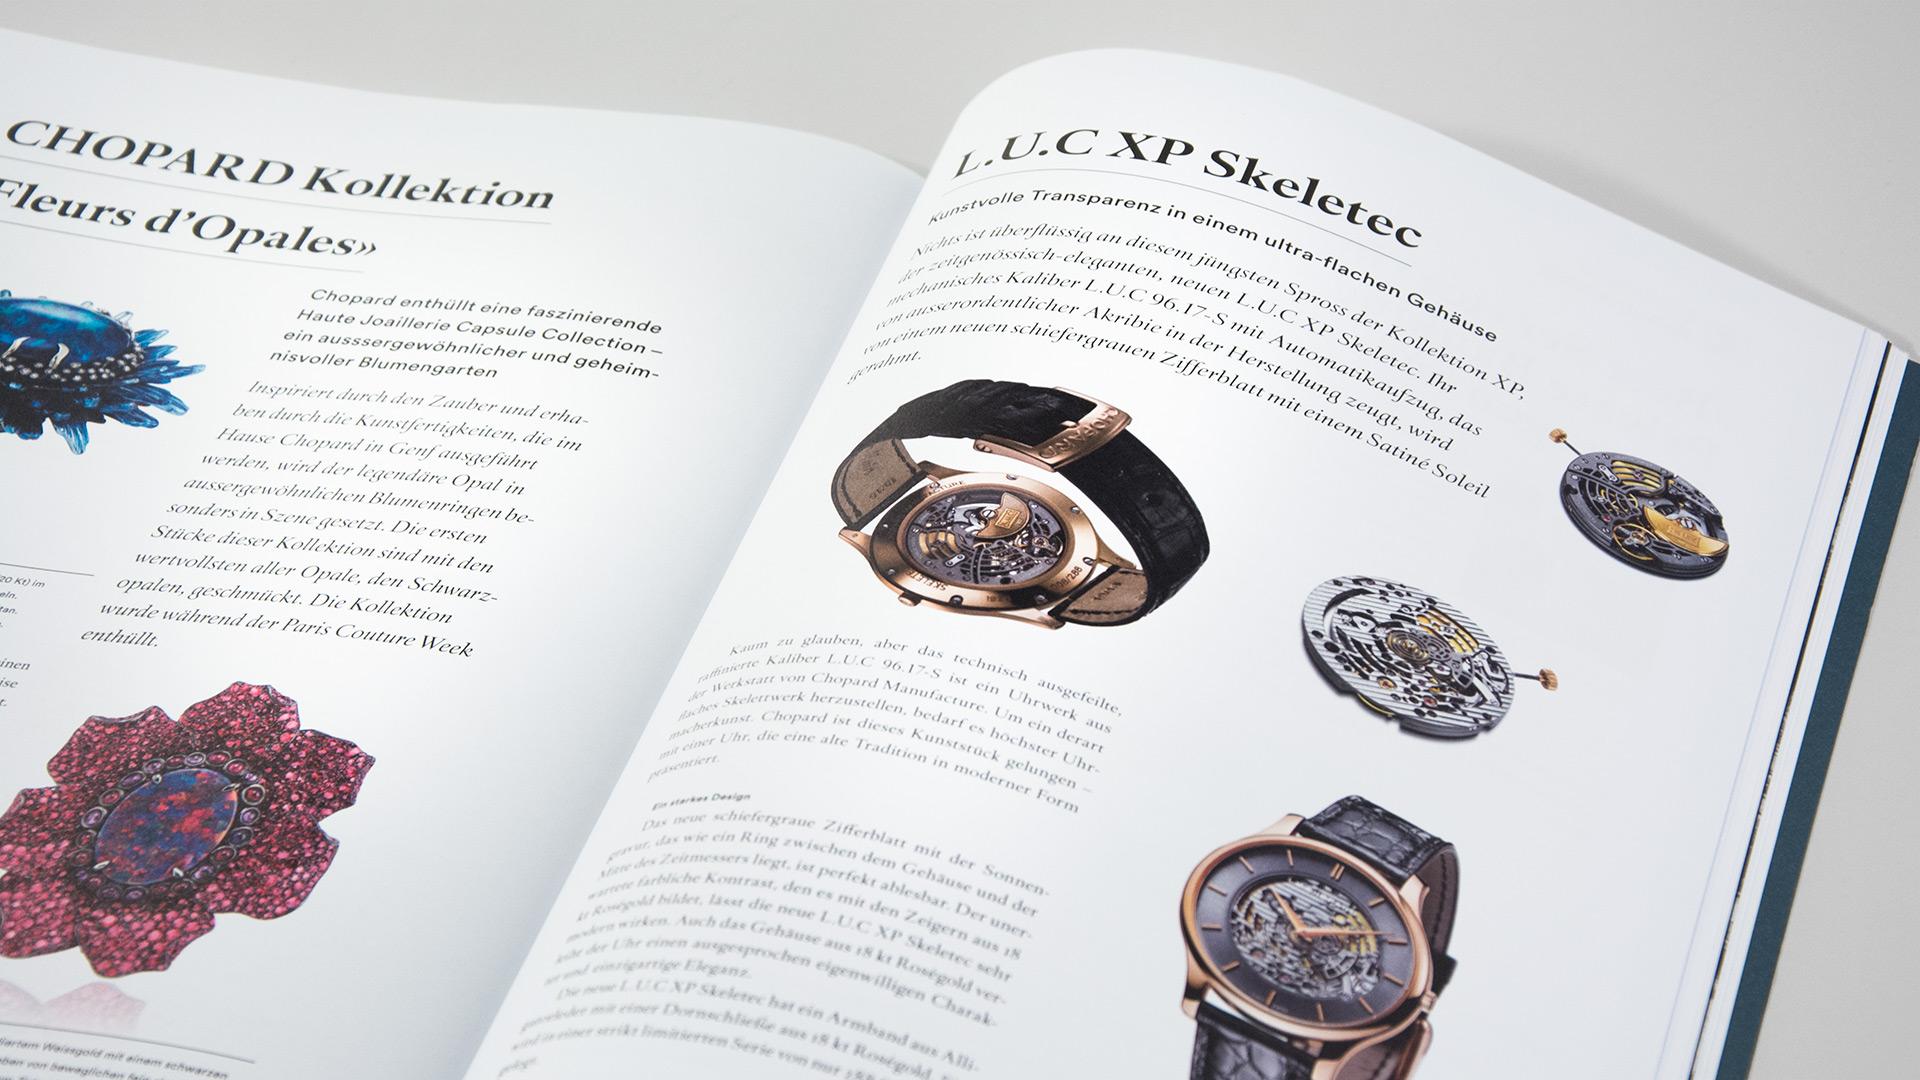 equipe-visuelle-grafikatelier-luzern-emmemnbruecke-suvretta-house-magazine-st-moritz-editorial-design